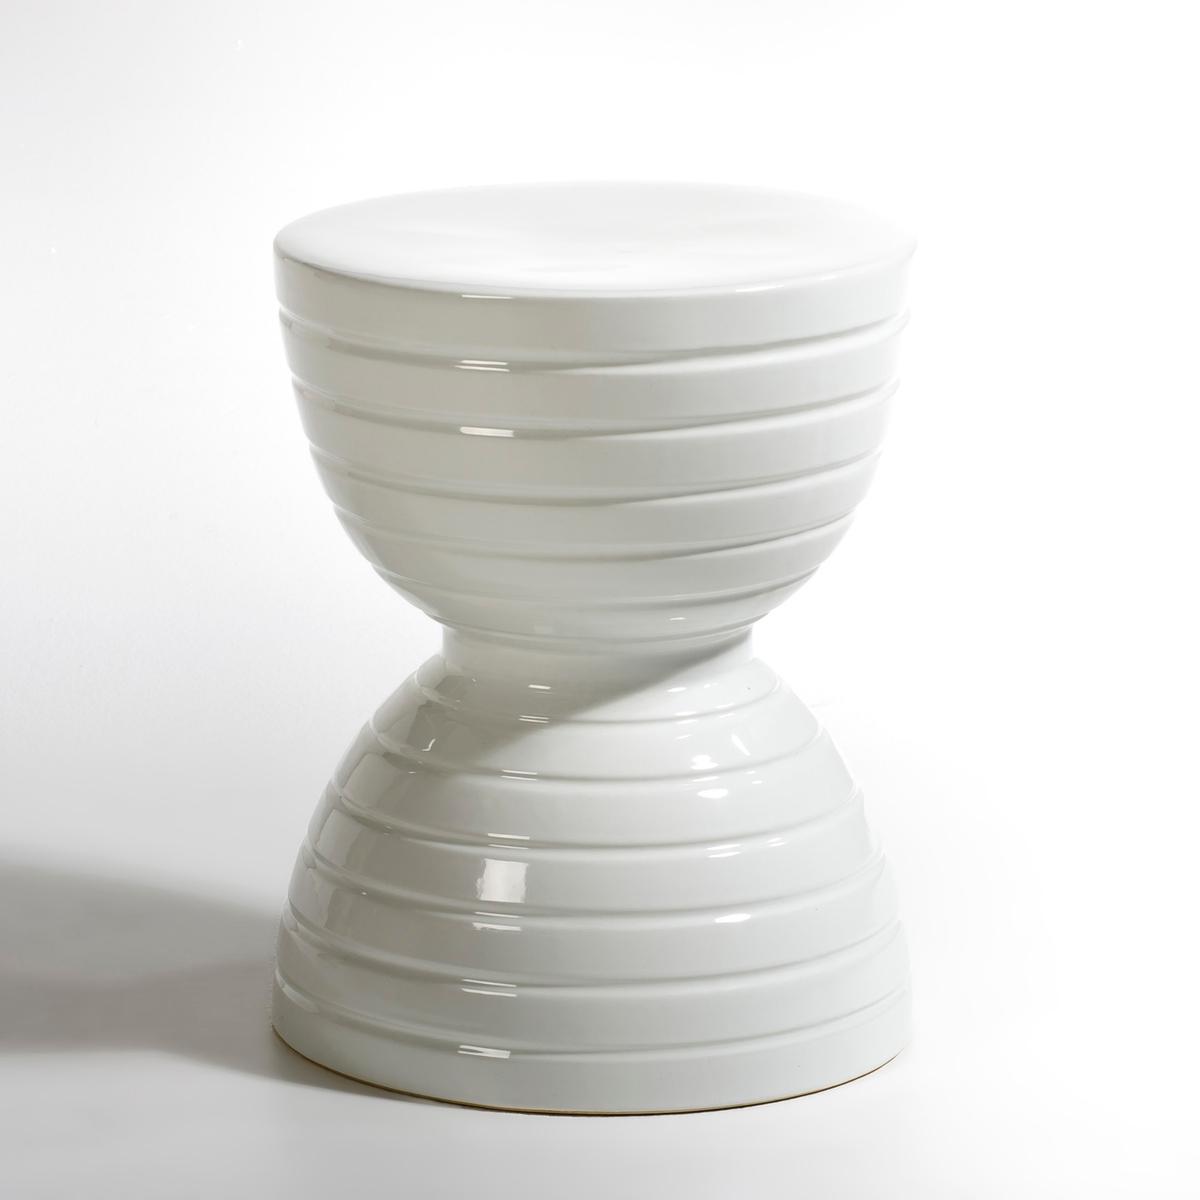 Столик керамический журнальный, Spool керамический столик табурет garden stool белый